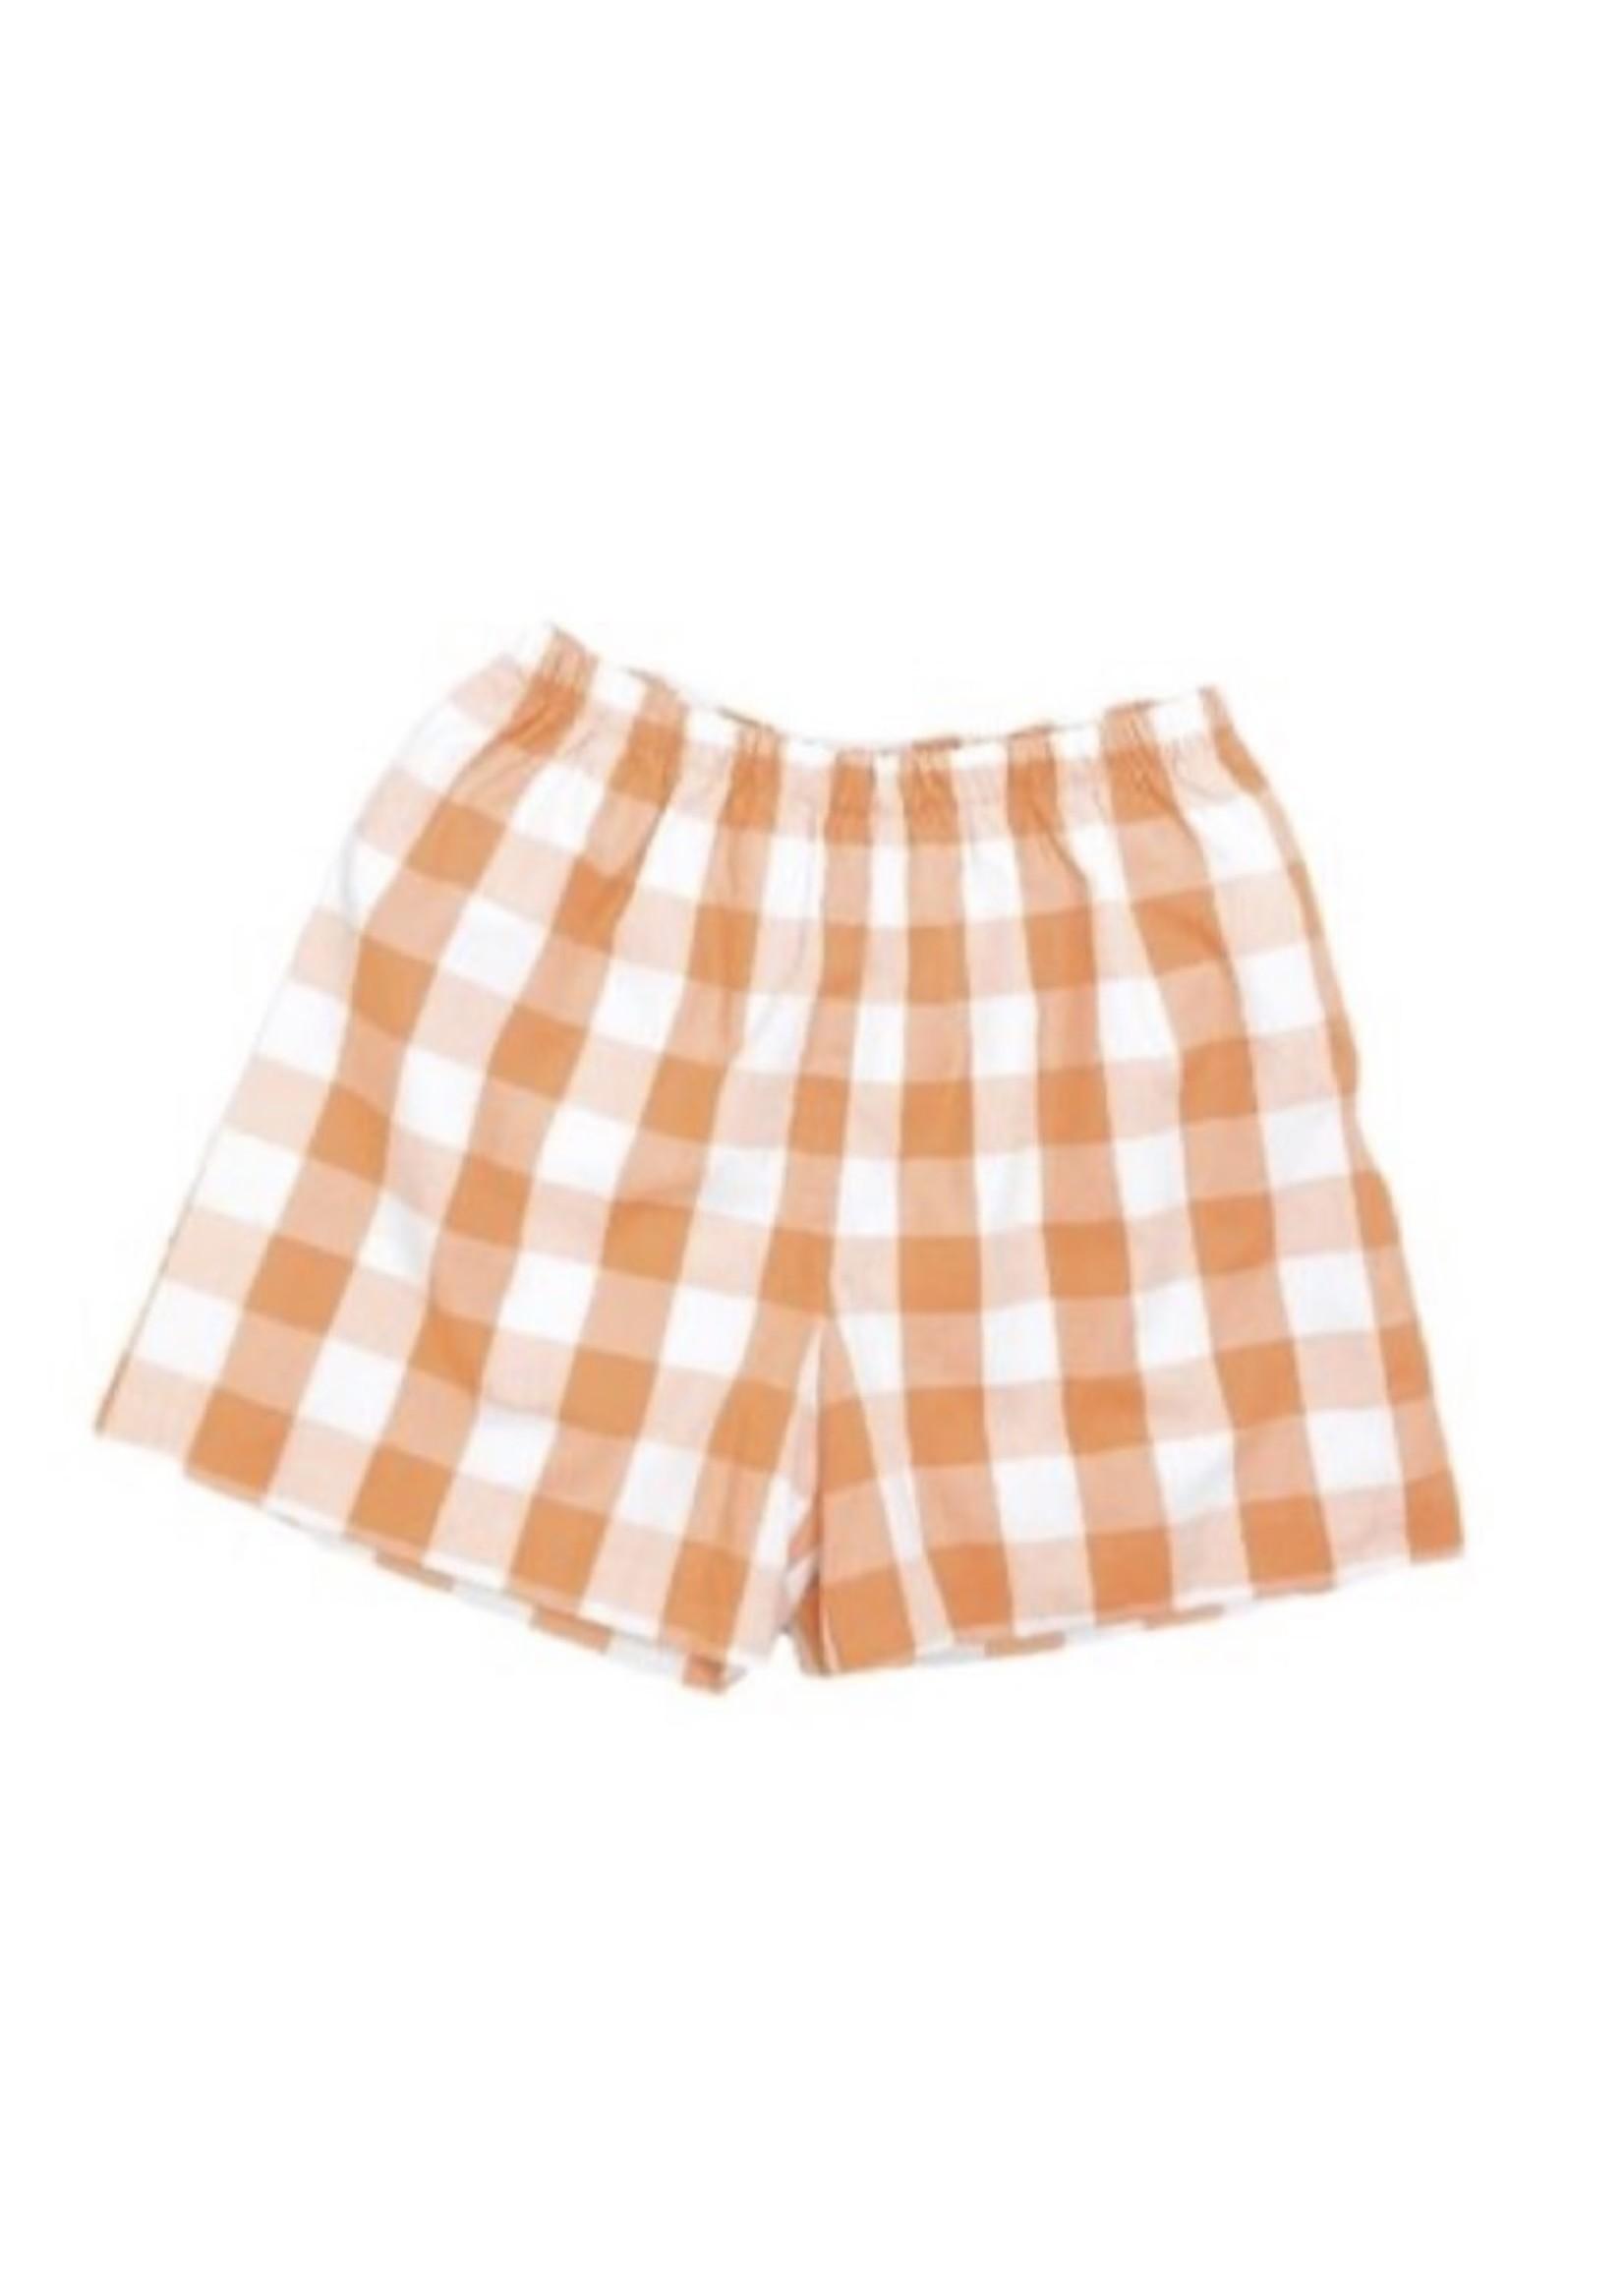 james and lottie Orange Conrad Shorts